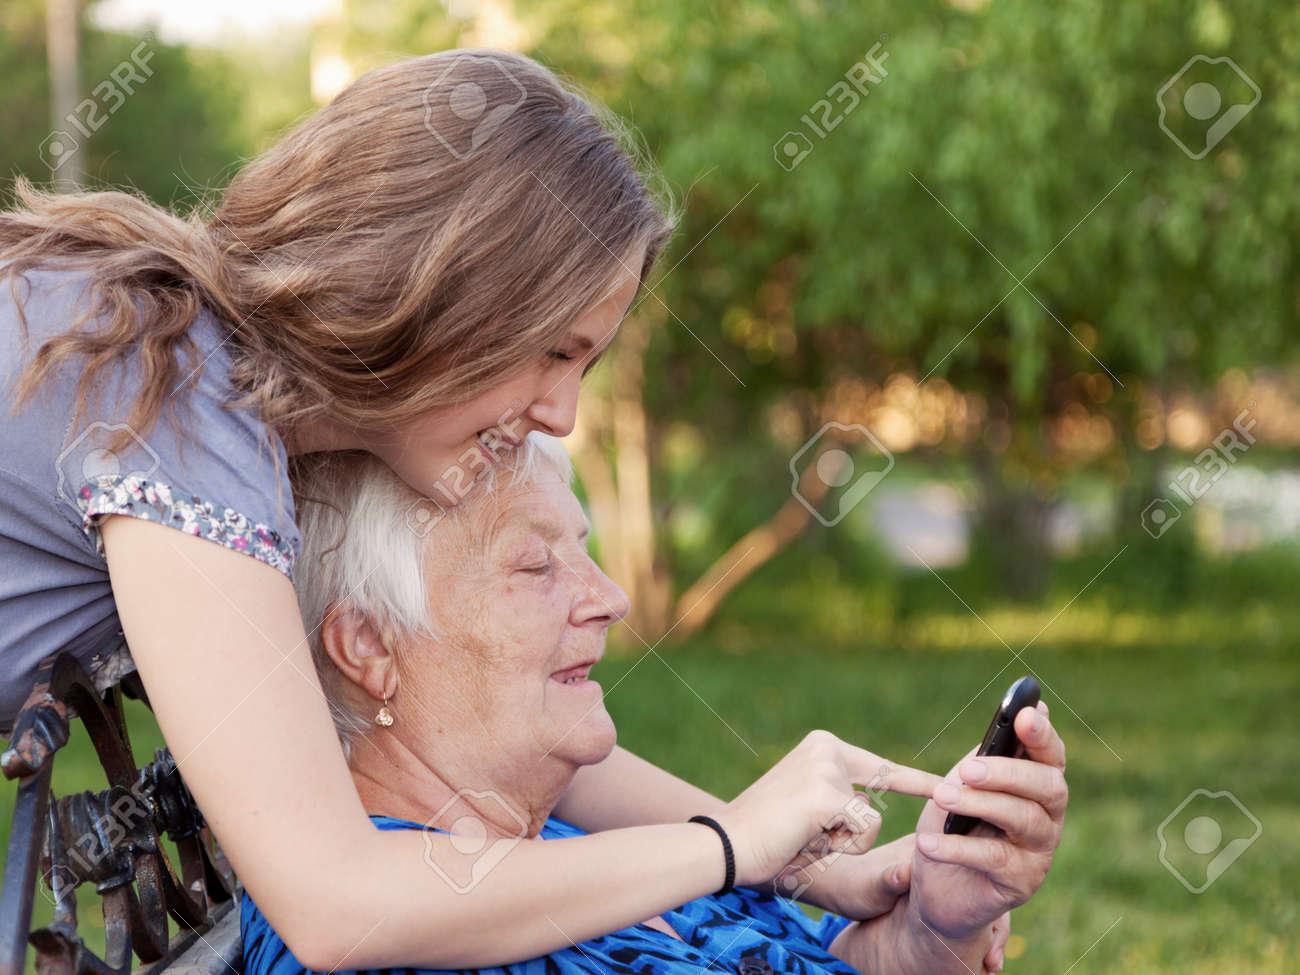 Як внук трахає бабушку 24 фотография